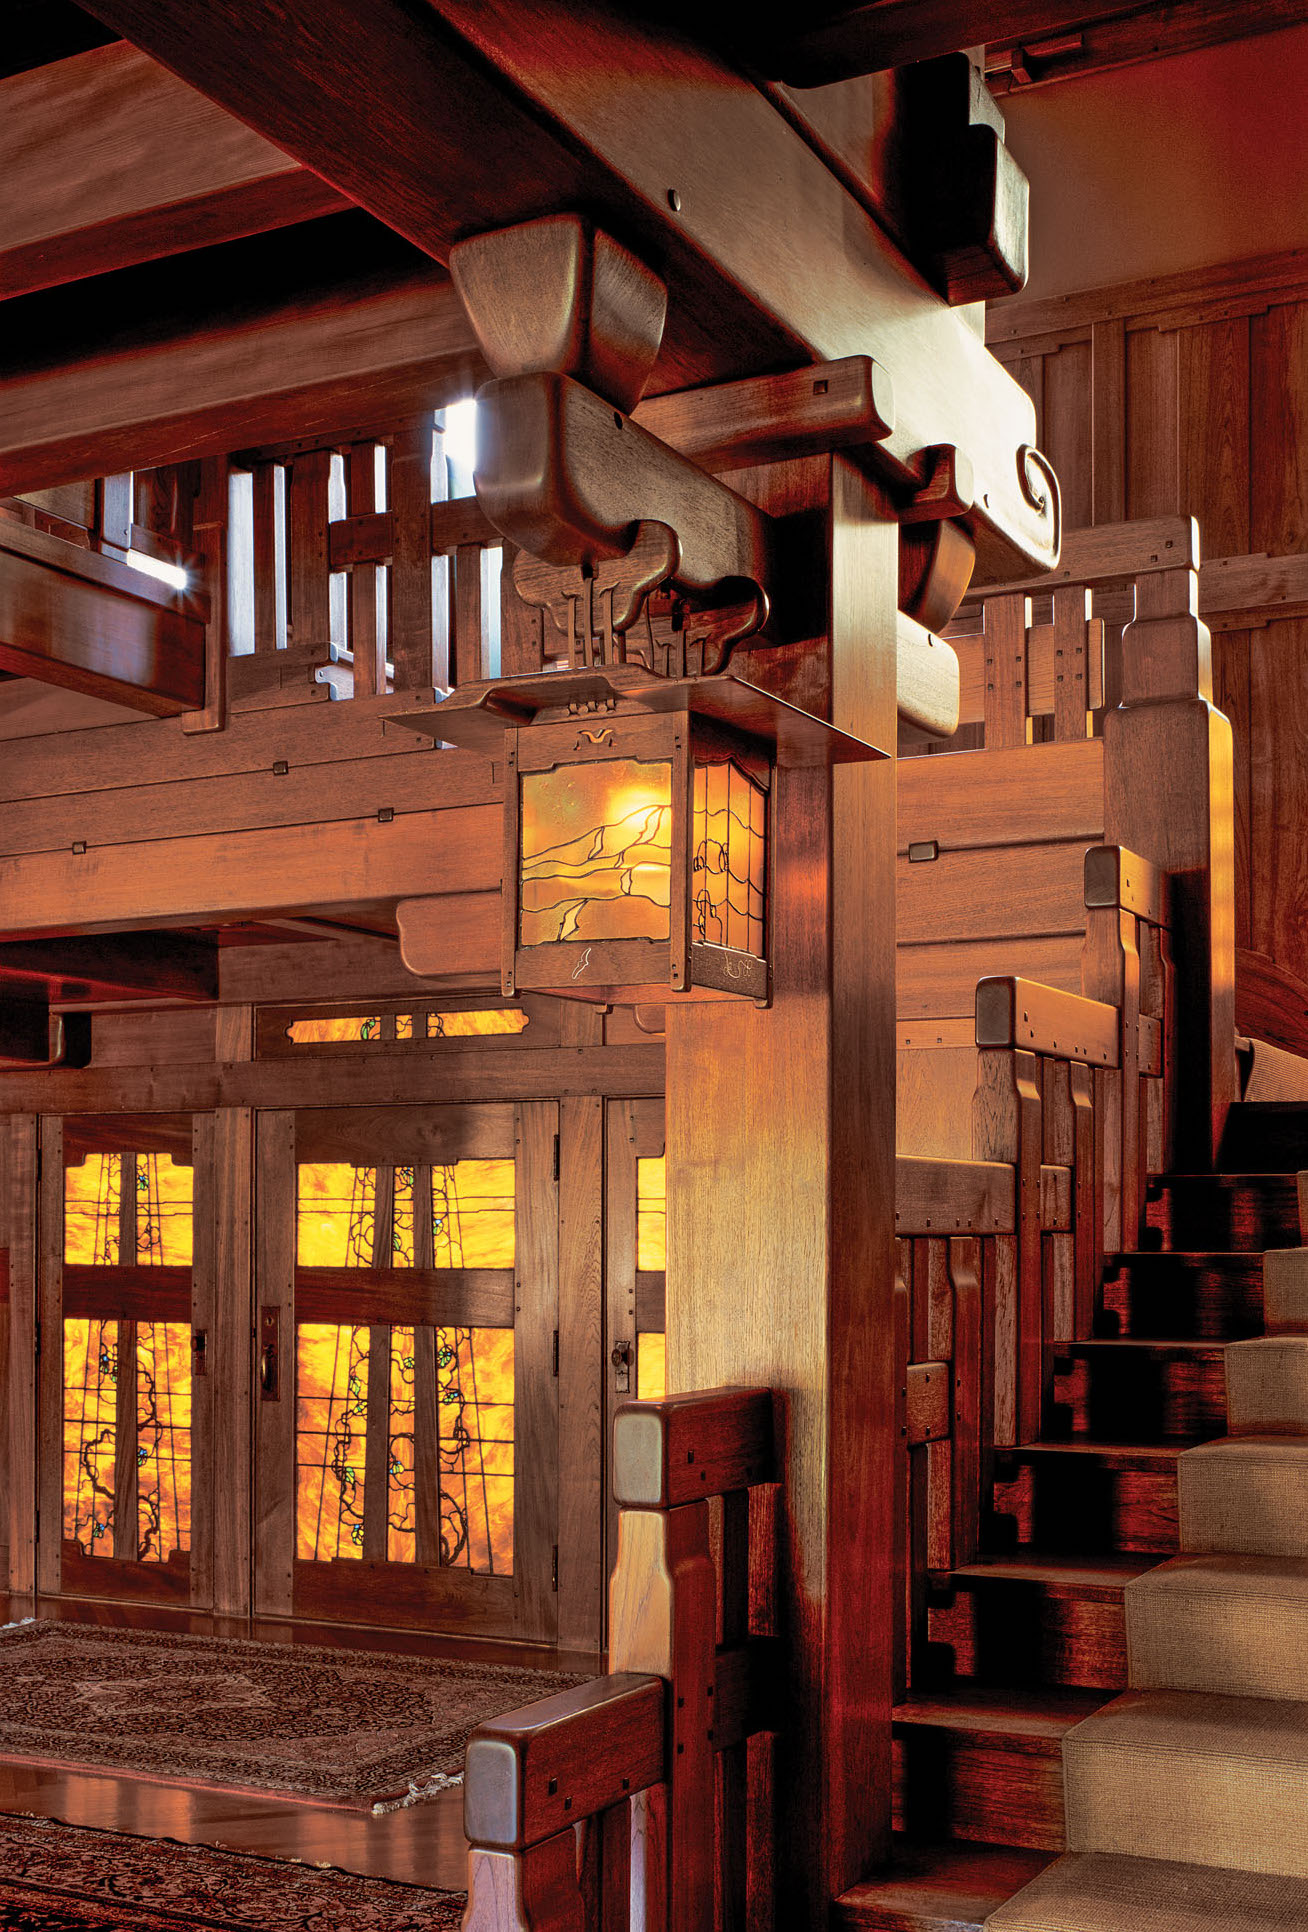 Frank Lloyd Wright Falling Water Wallpaper The Japanese Influence Of Greene Amp Greene Old House